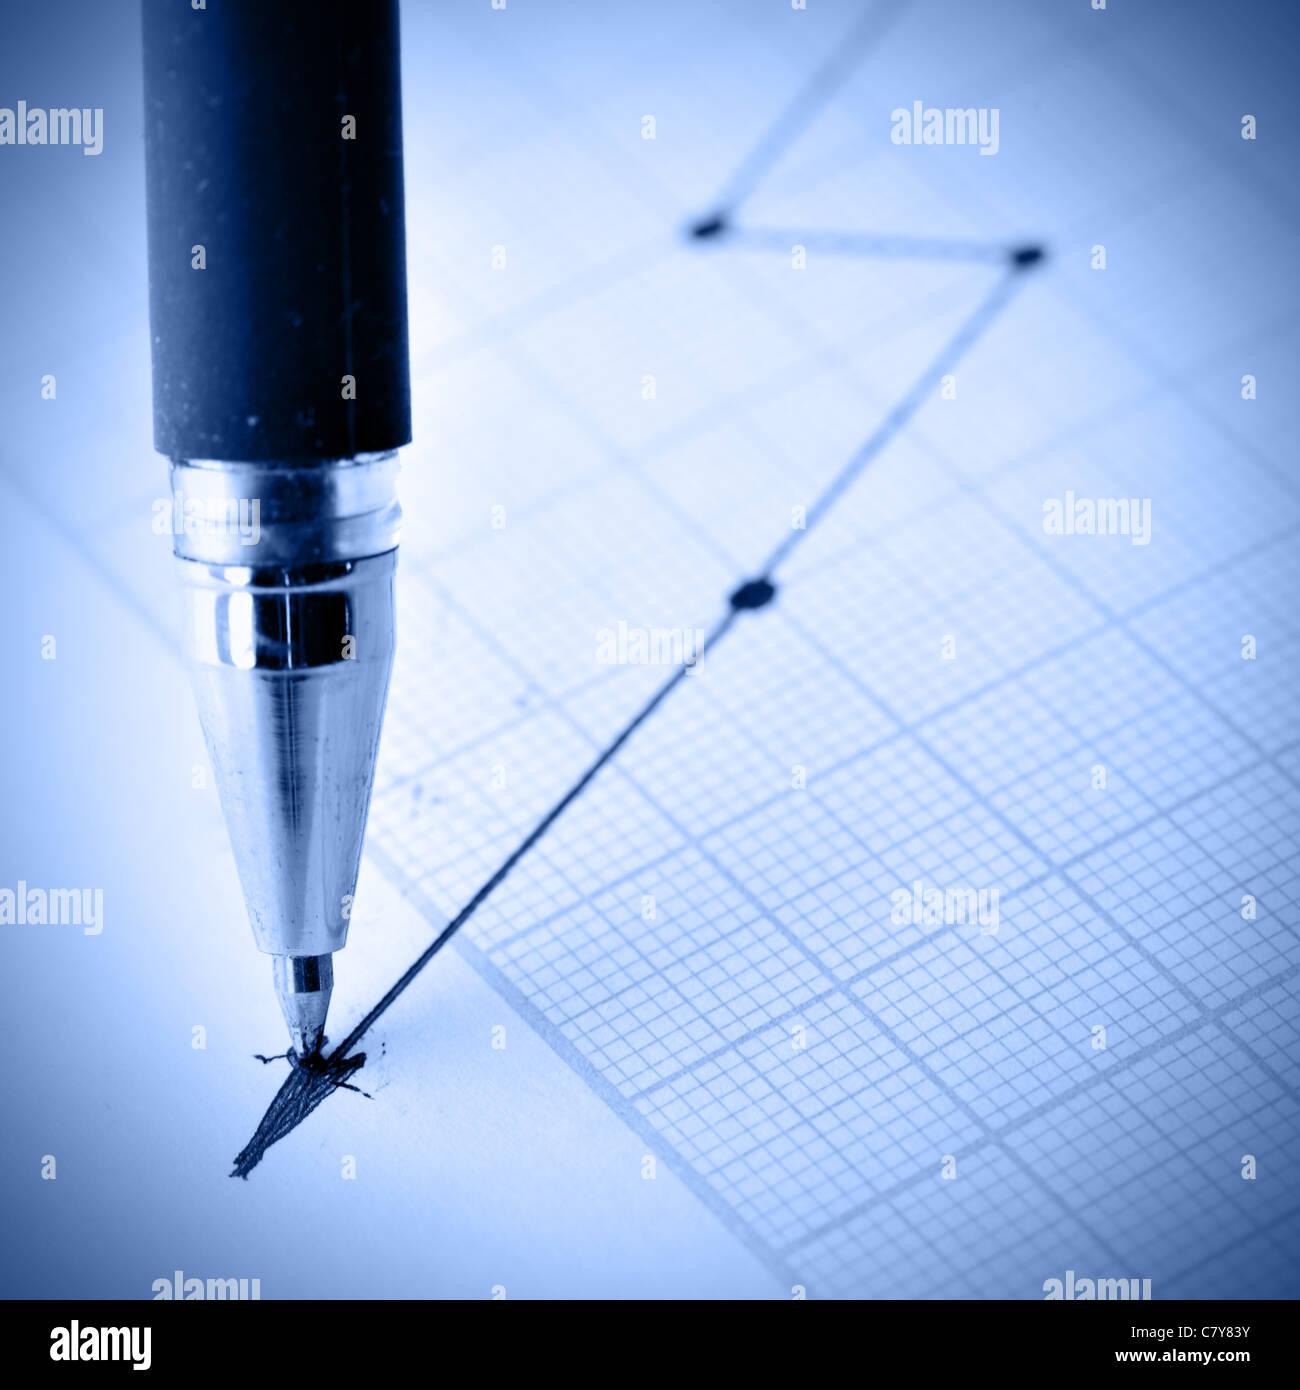 Dessin stylo graphique une crise. Shallow DOF! Photo Stock